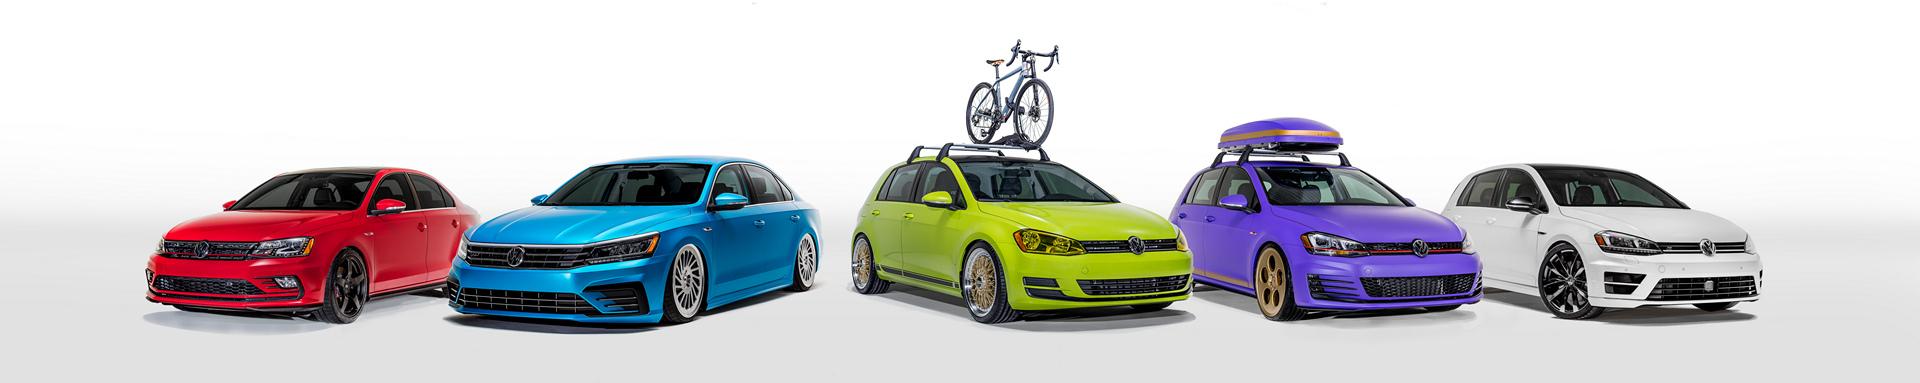 VW Enthusiast Vehicle Fleet © Volkswagen AG